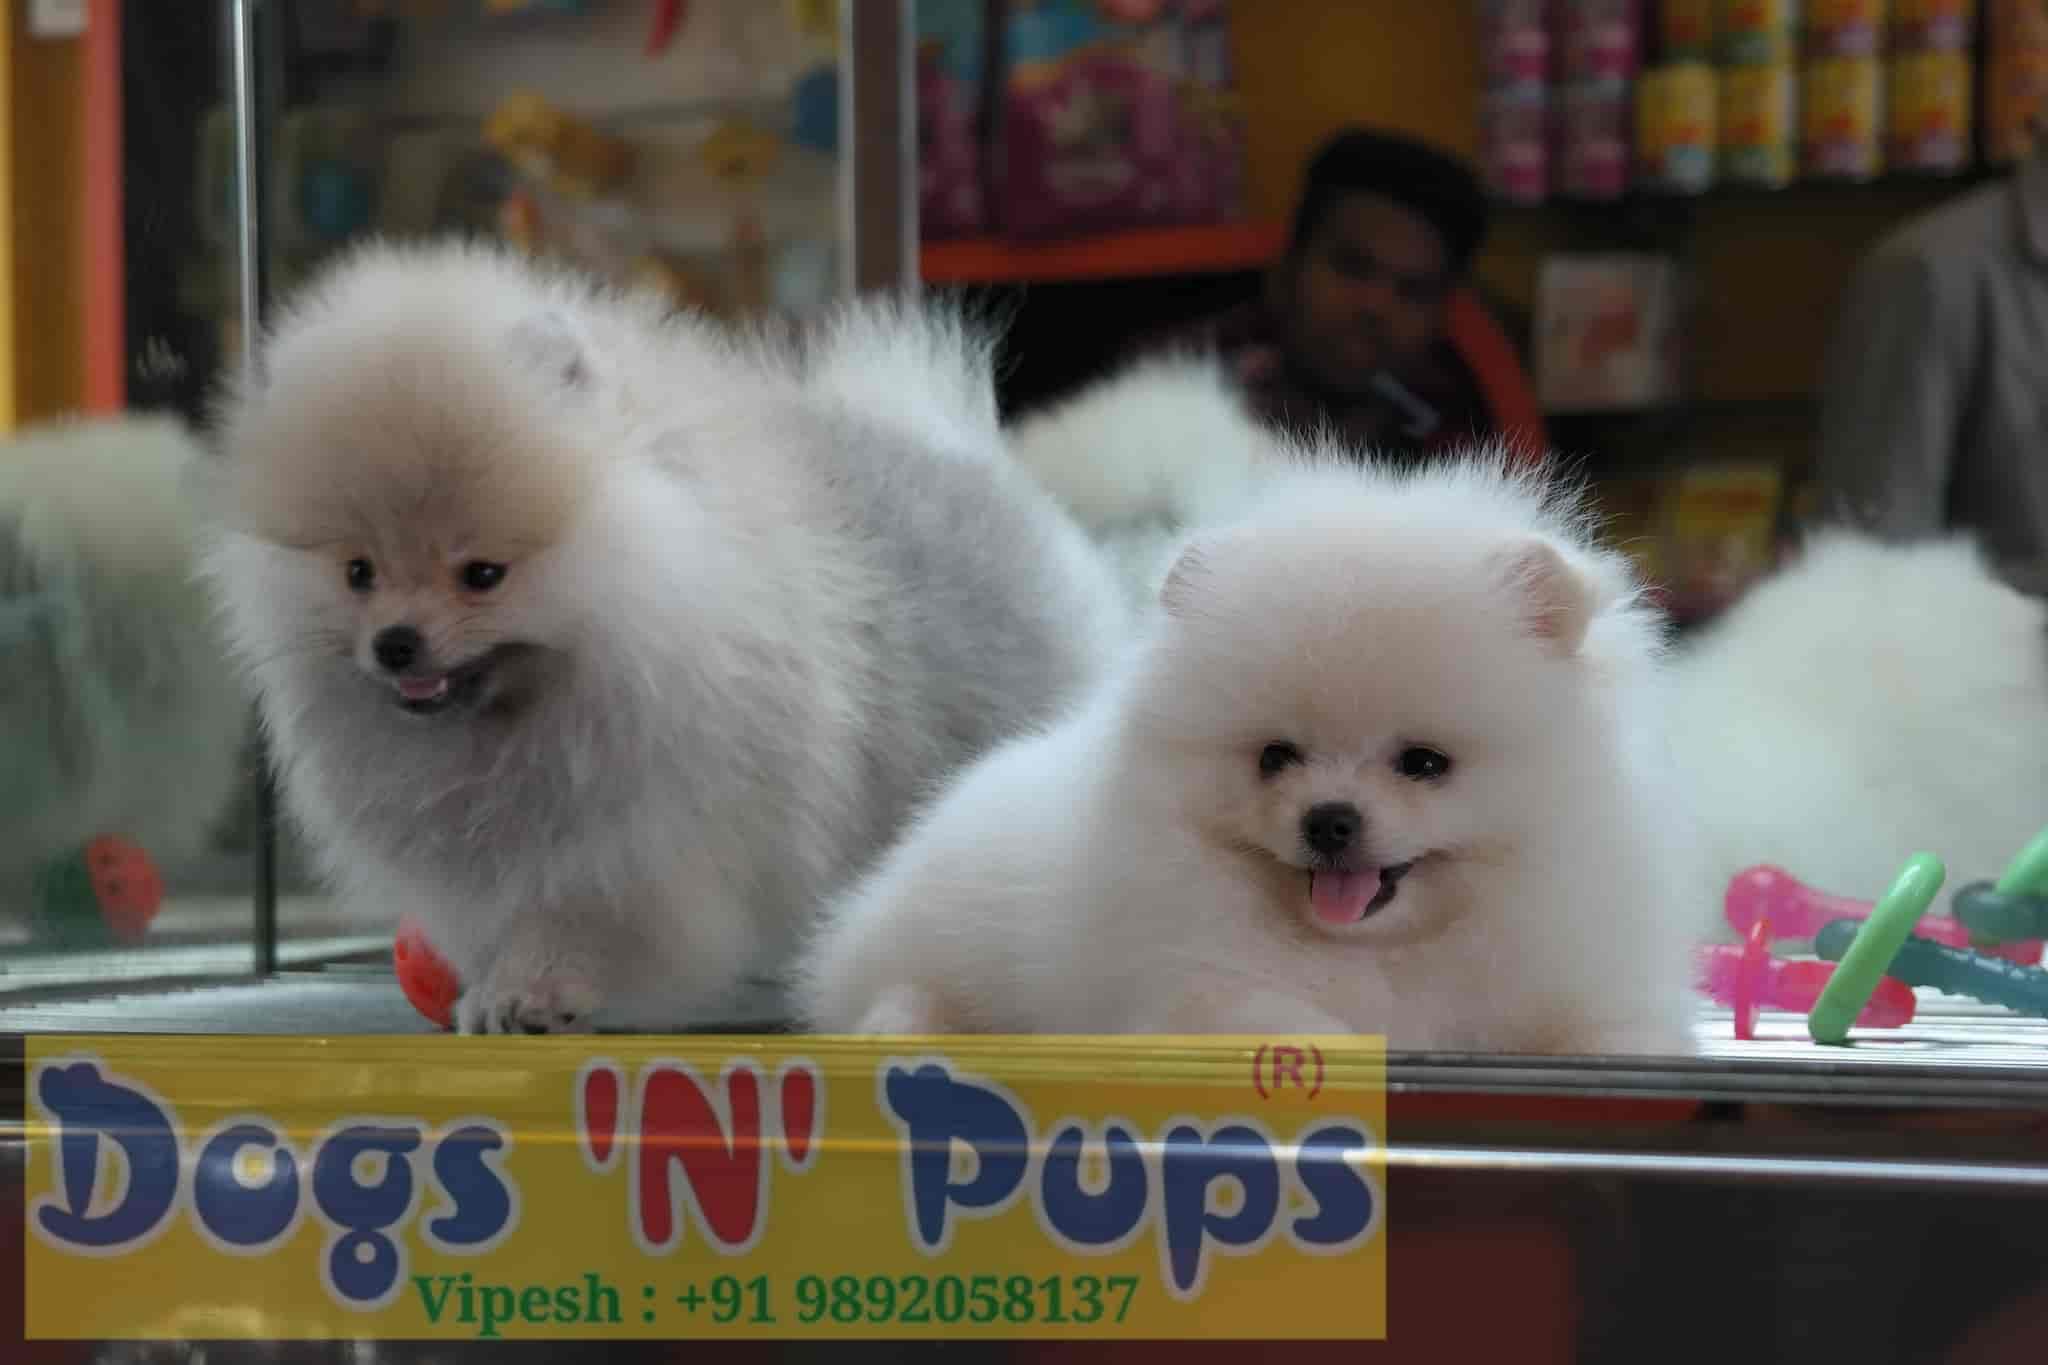 Dogs N Pups Nerul Pet Shops In Mumbai Justdial